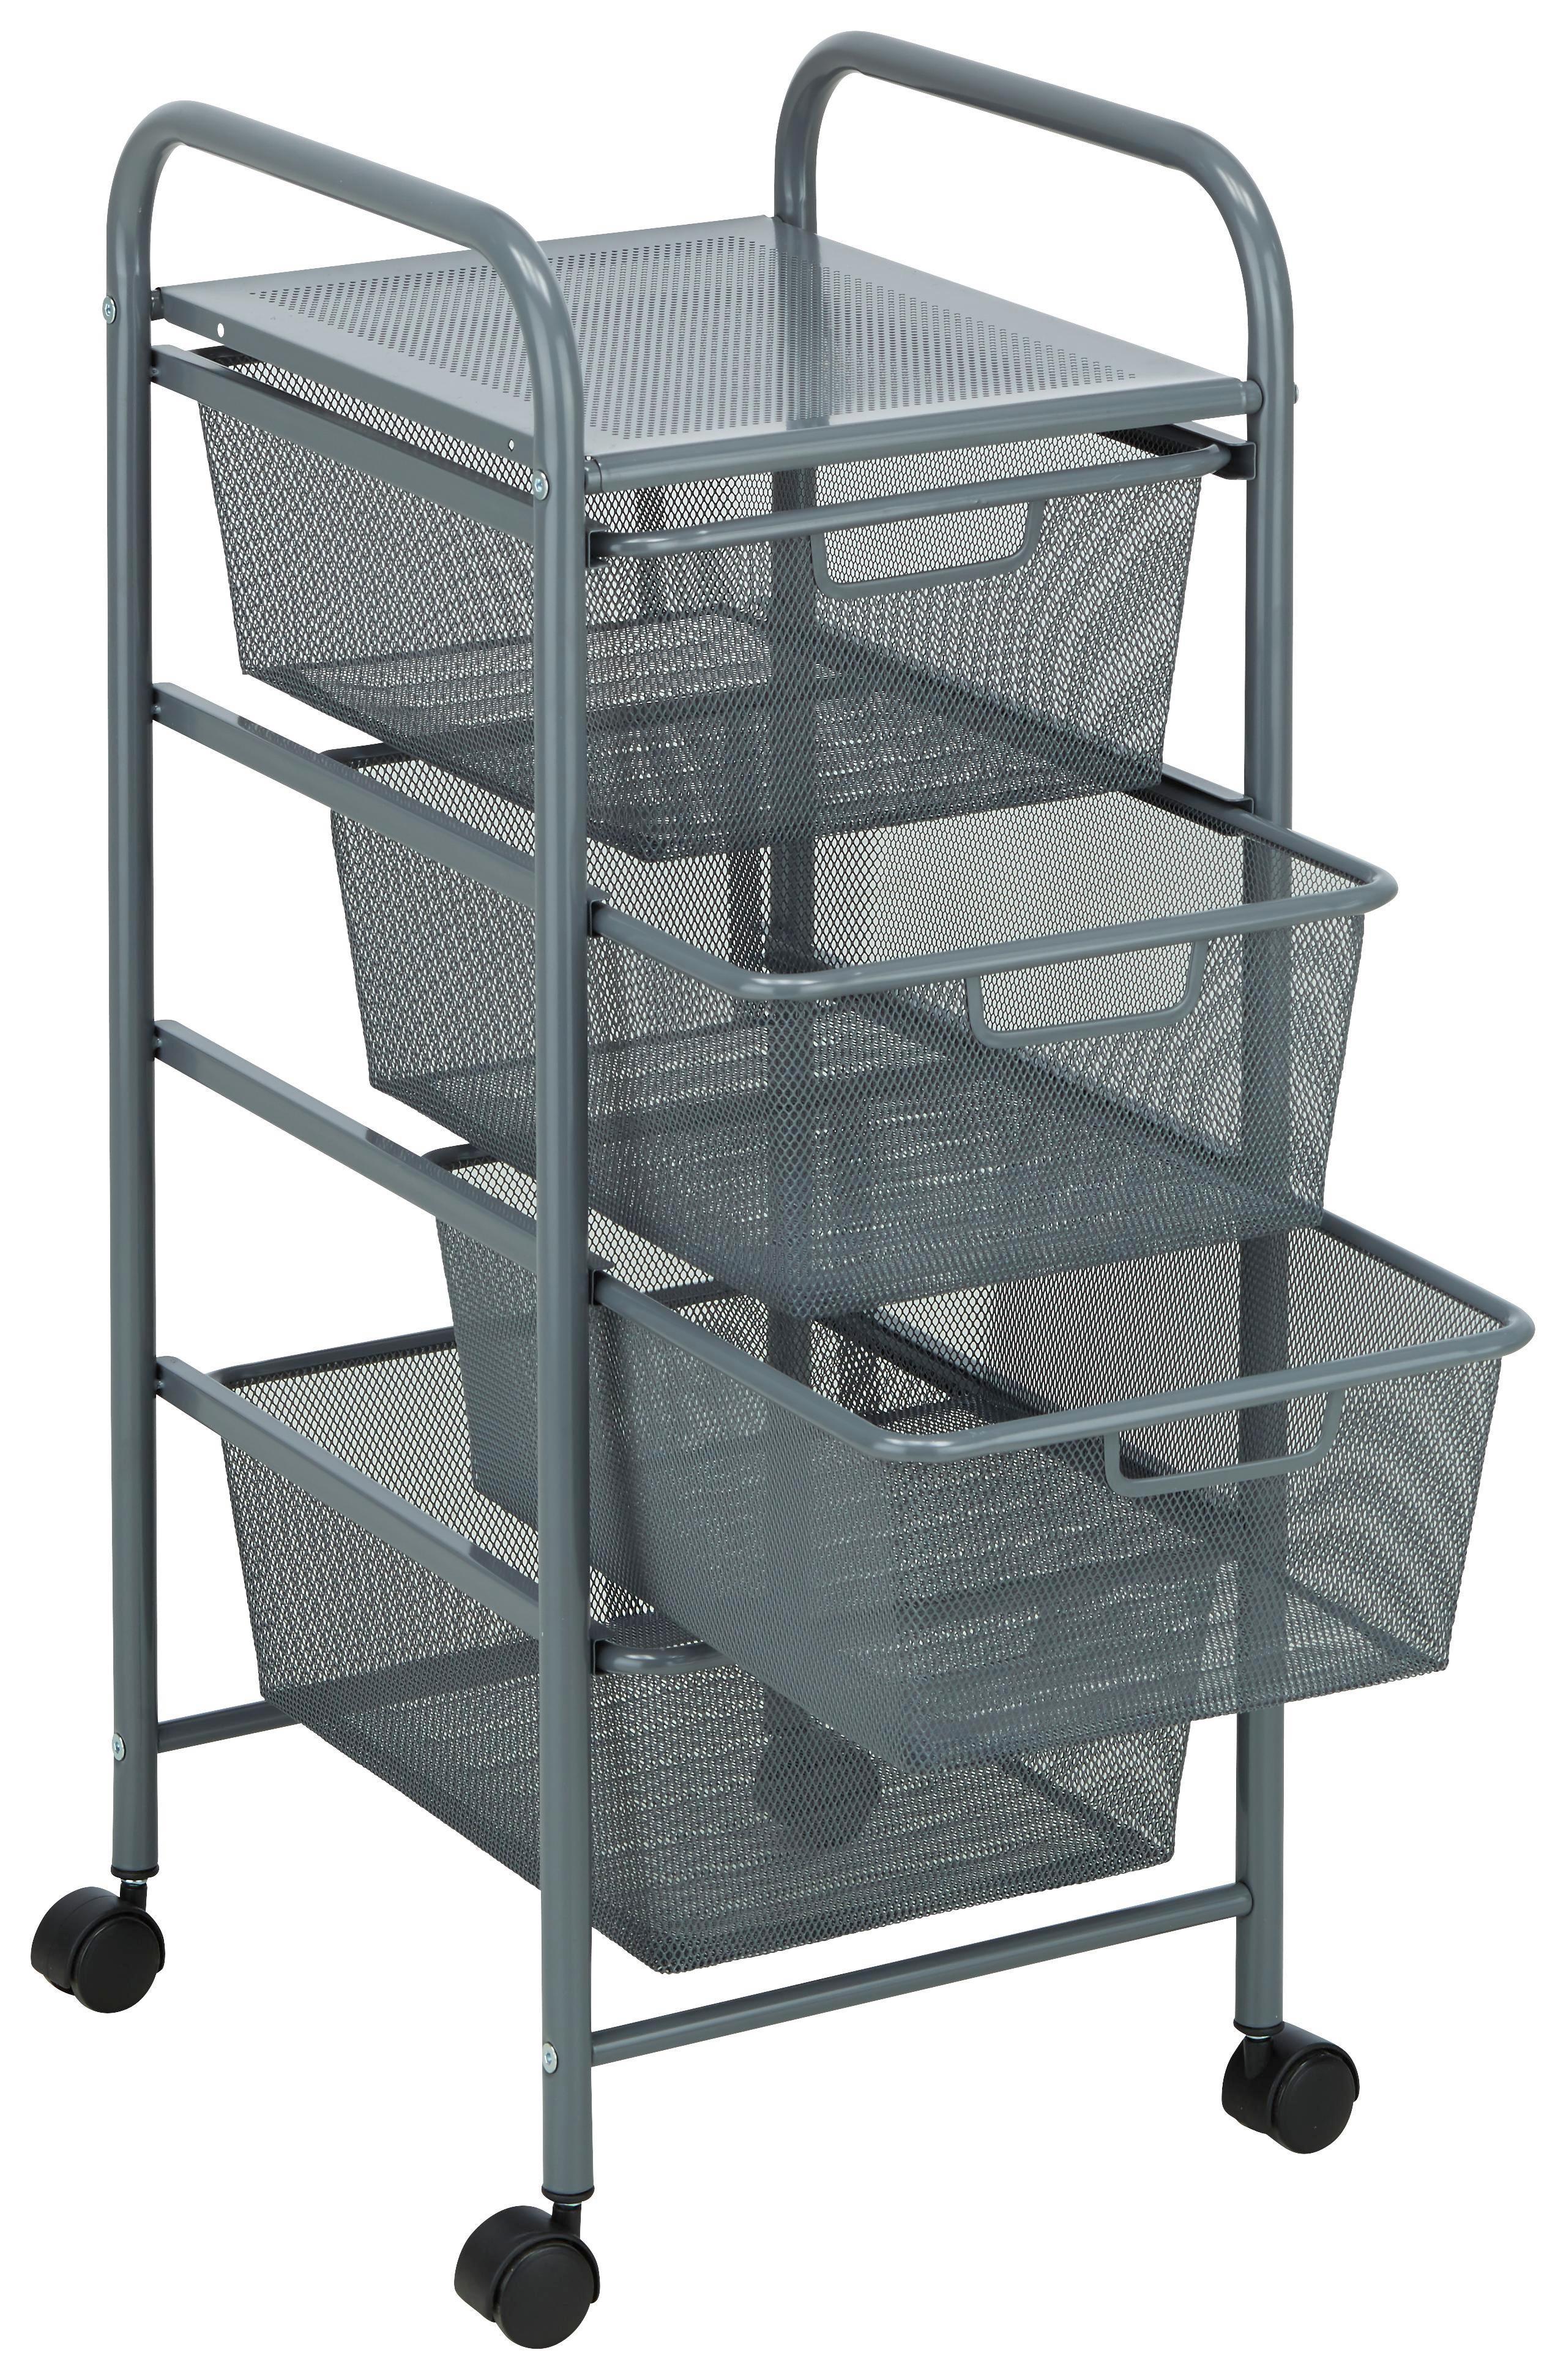 Rollcontainer metall  Rollcontainer in Grau online kaufen ➤ mömax